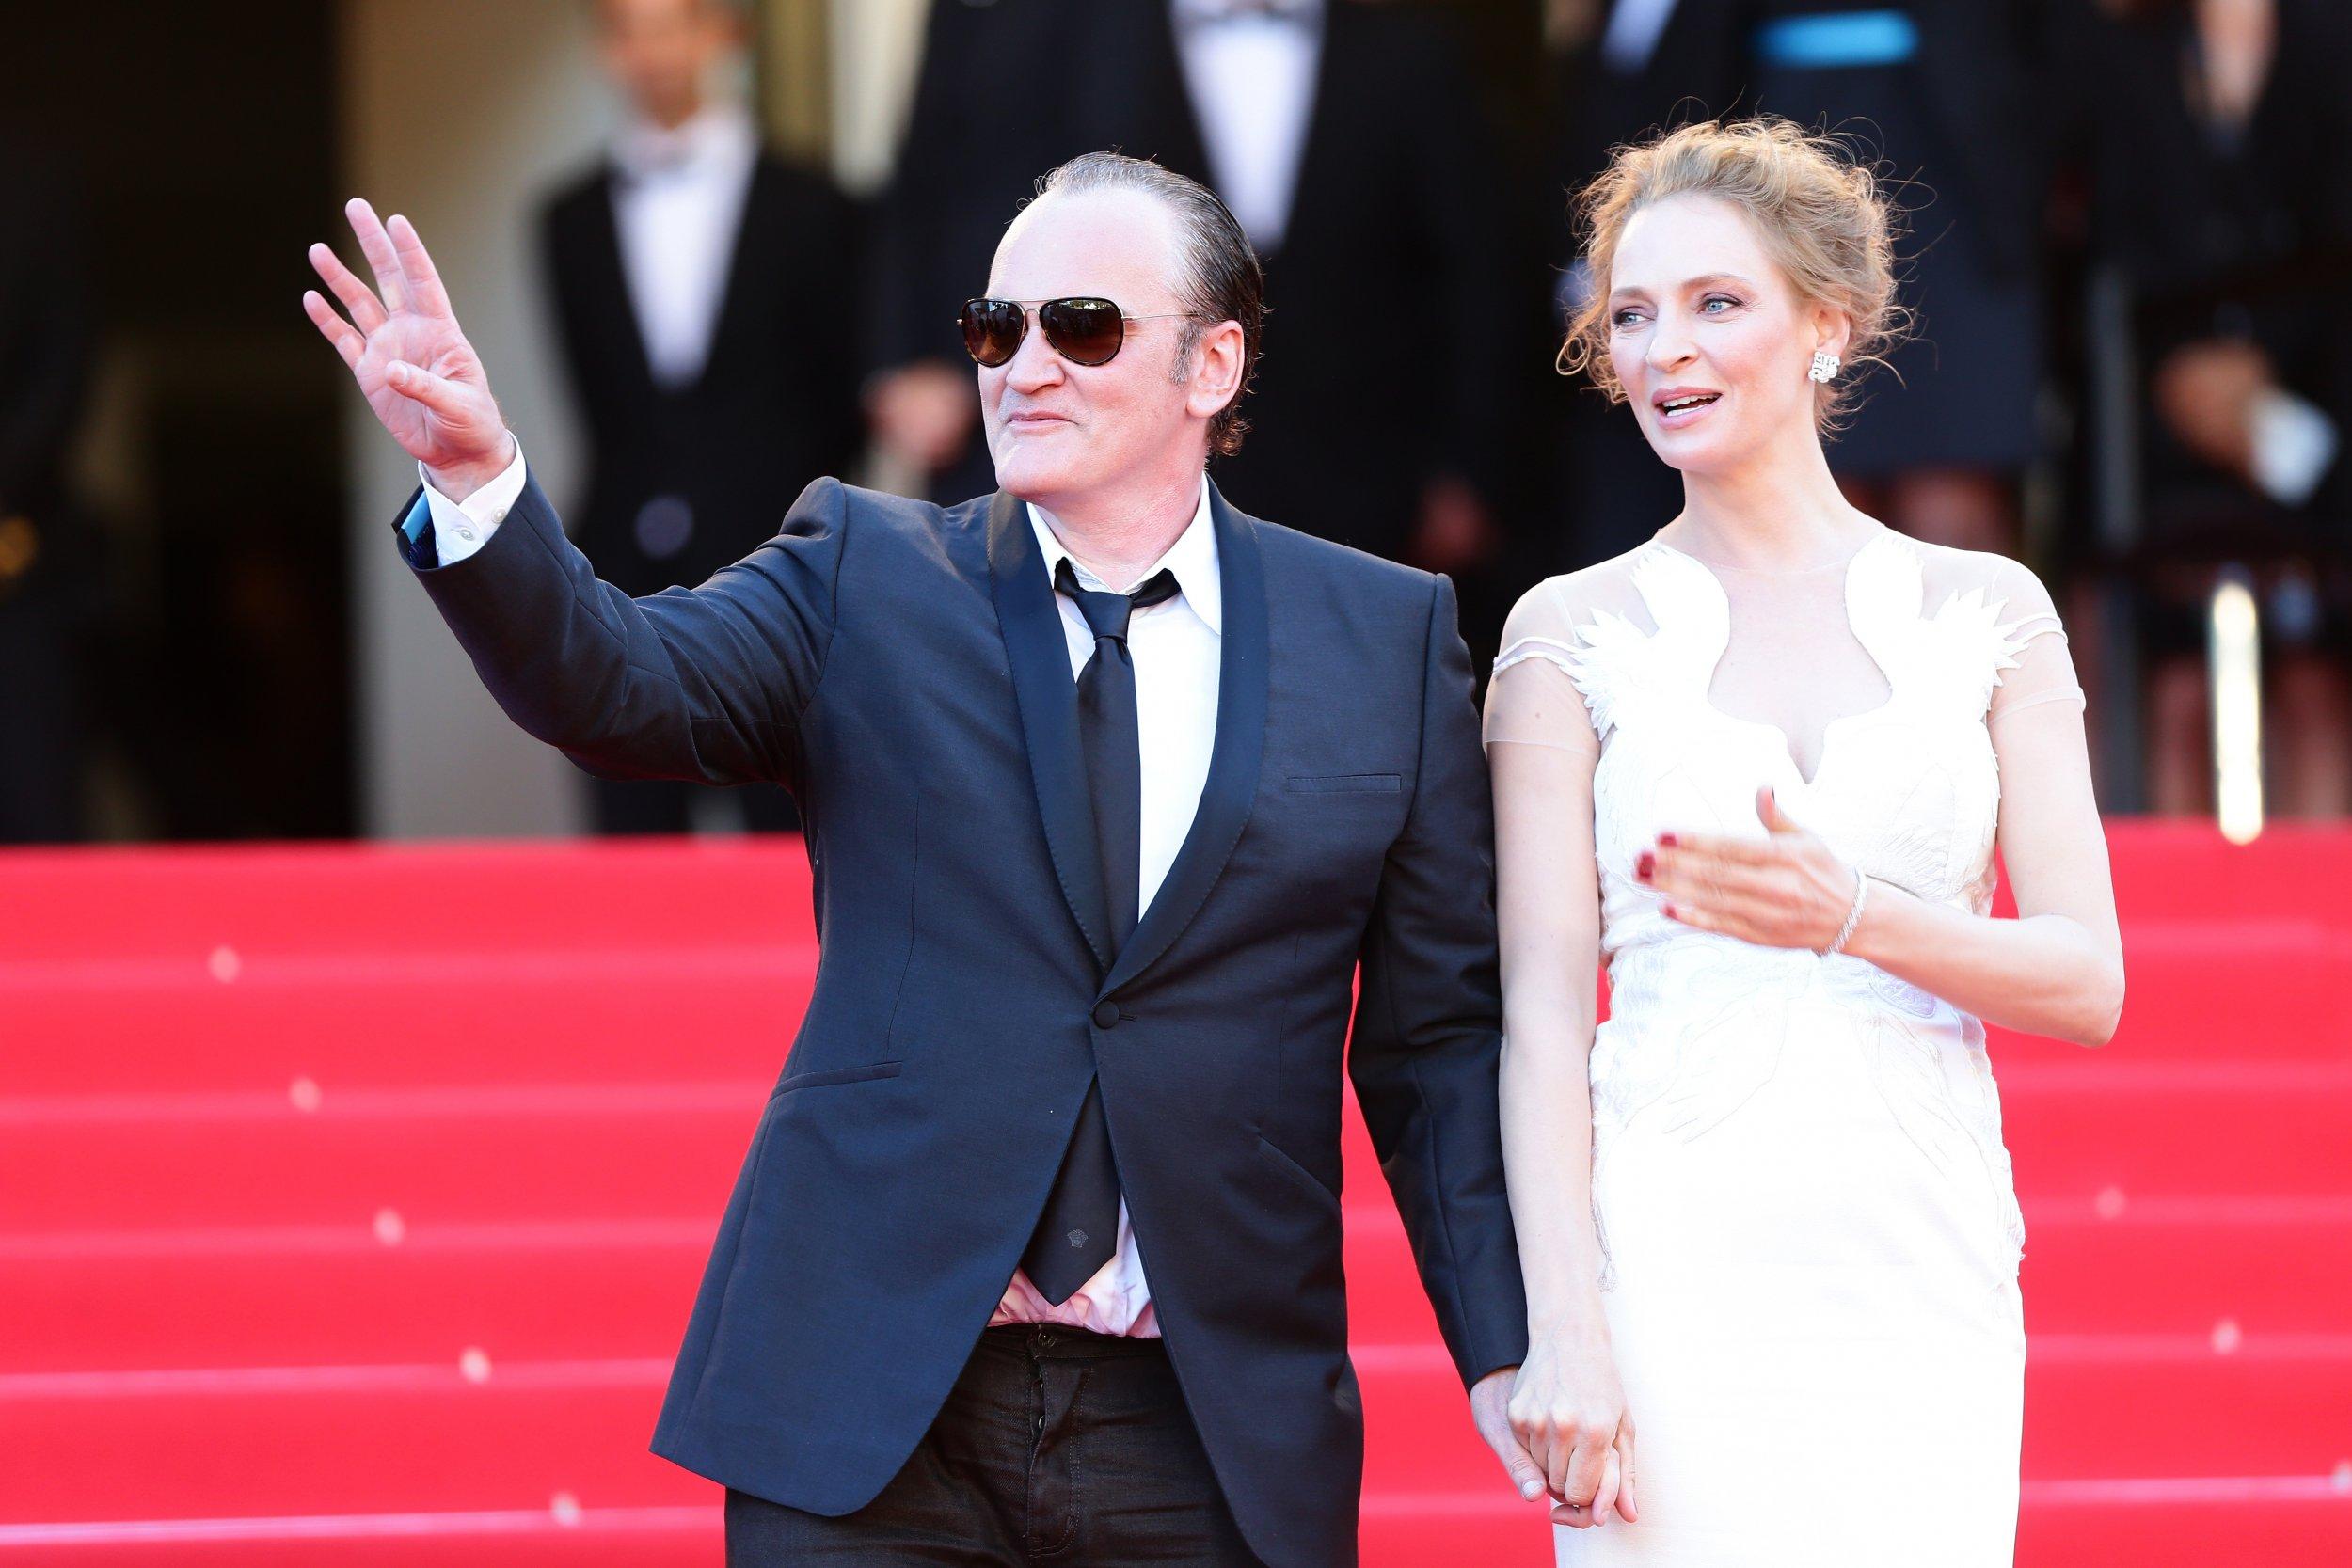 Quentin Tarantino on choking, spitting on Uma Thurman